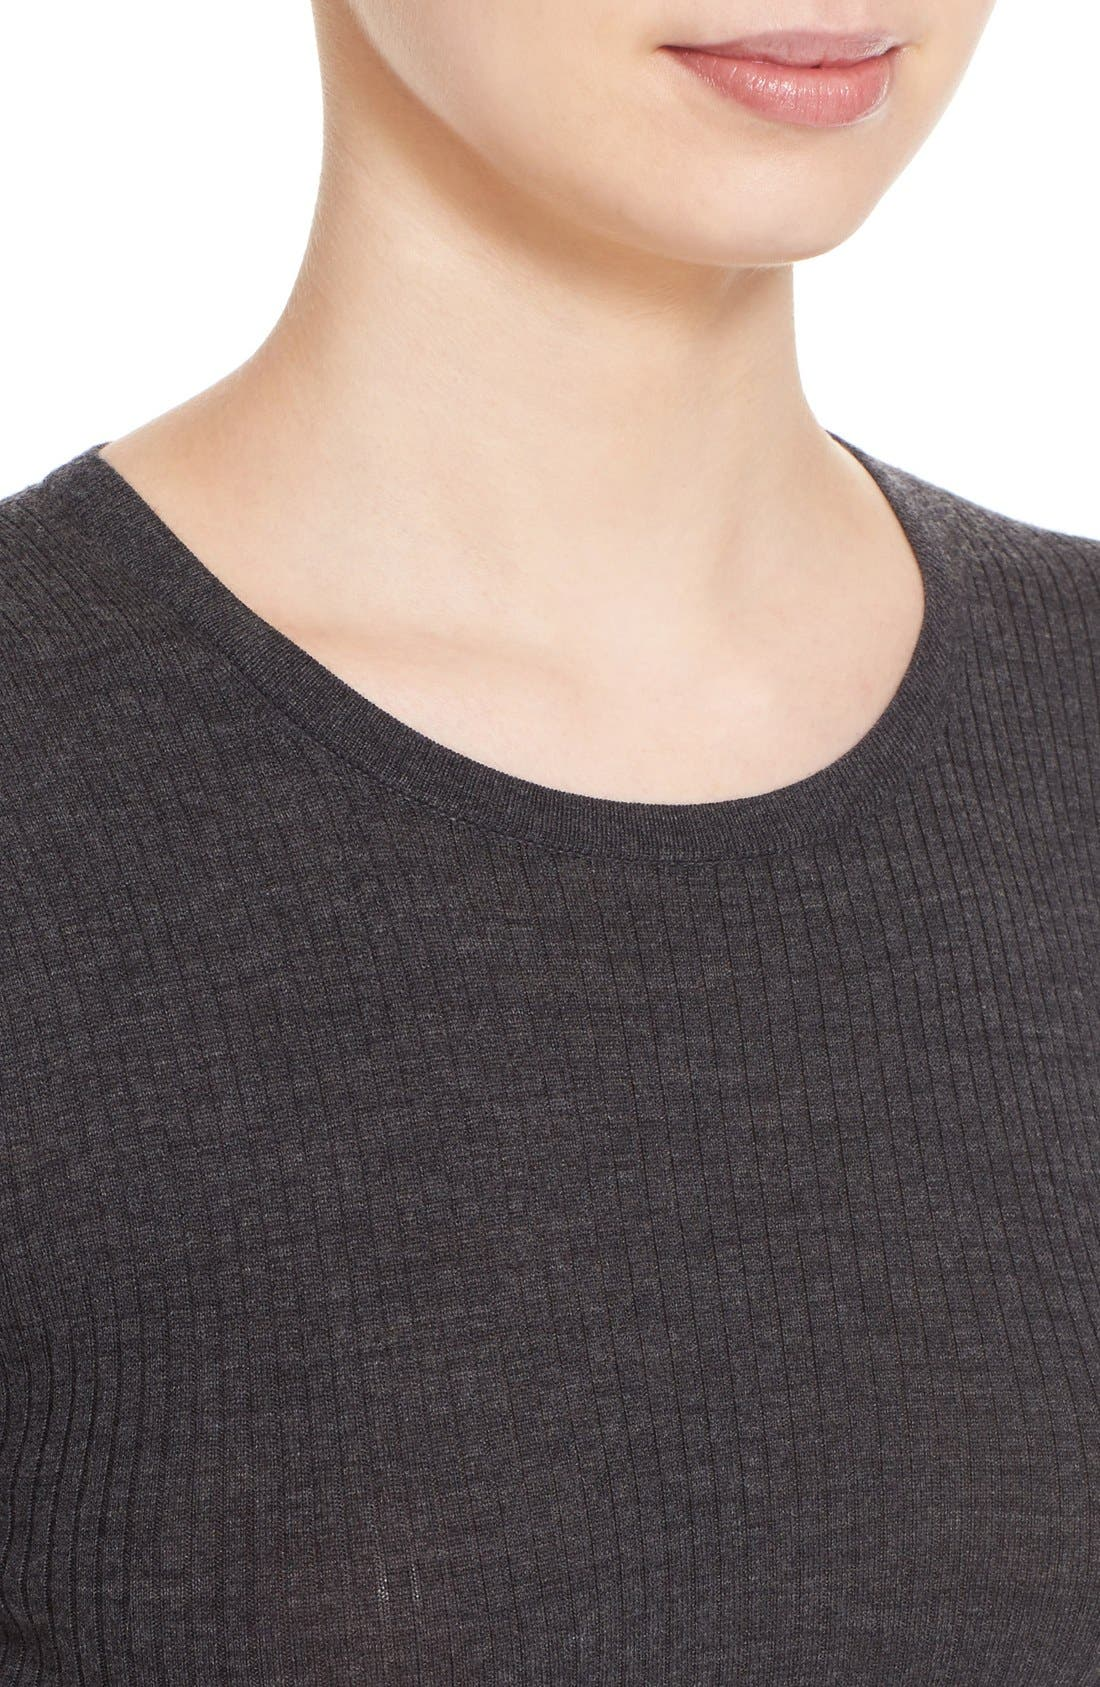 'Mirzi' Rib Knit Merino Wool Sweater,                             Alternate thumbnail 4, color,                             CHARCOAL MELANGE